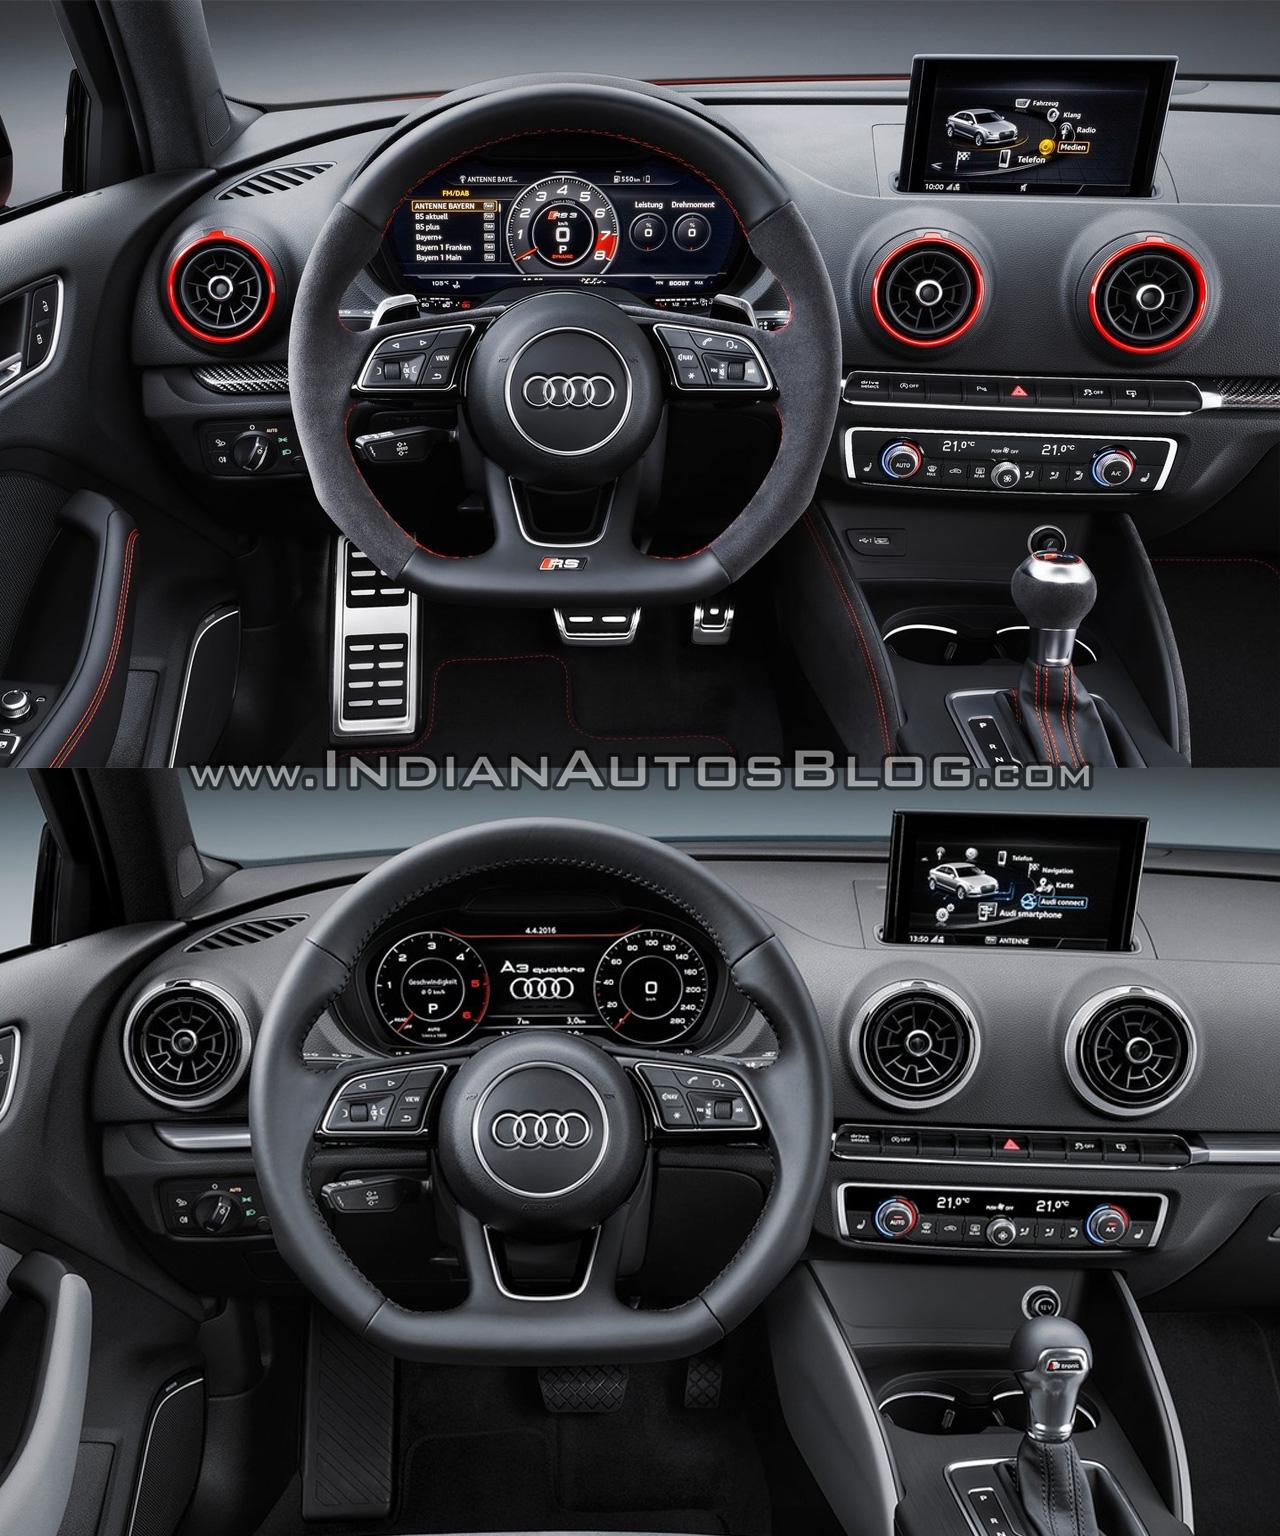 2018 Audi Rs 3 Interior: Audi RS 3 Sedan Vs. Audi A3 Sedan Interior